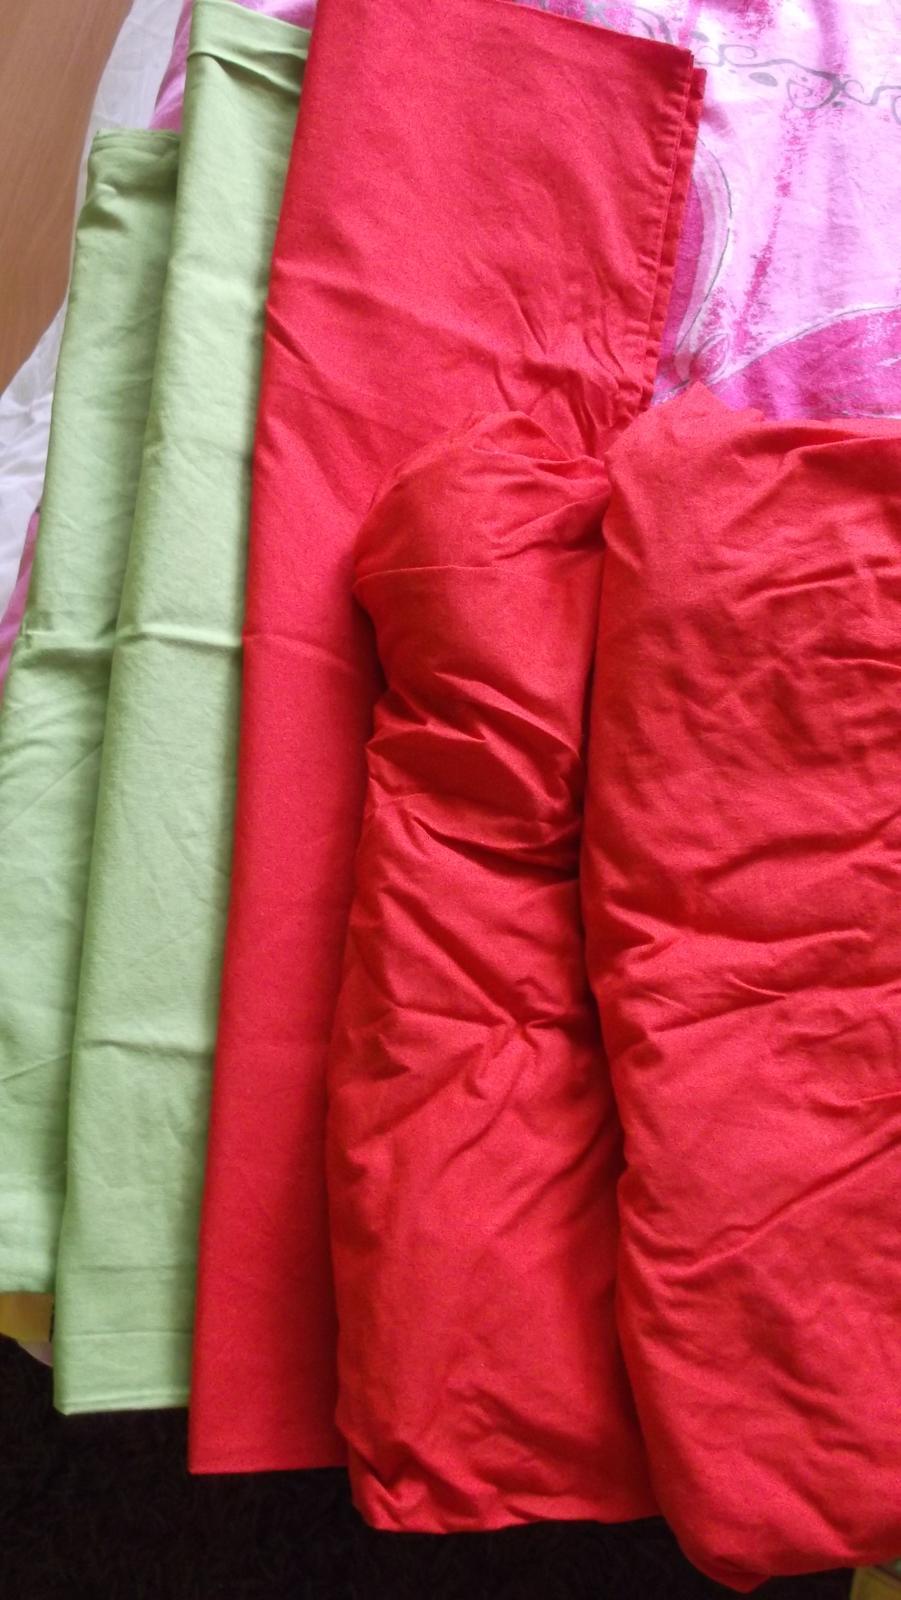 plachty a obliečky na vankúš sady ikea - Obrázok č. 1